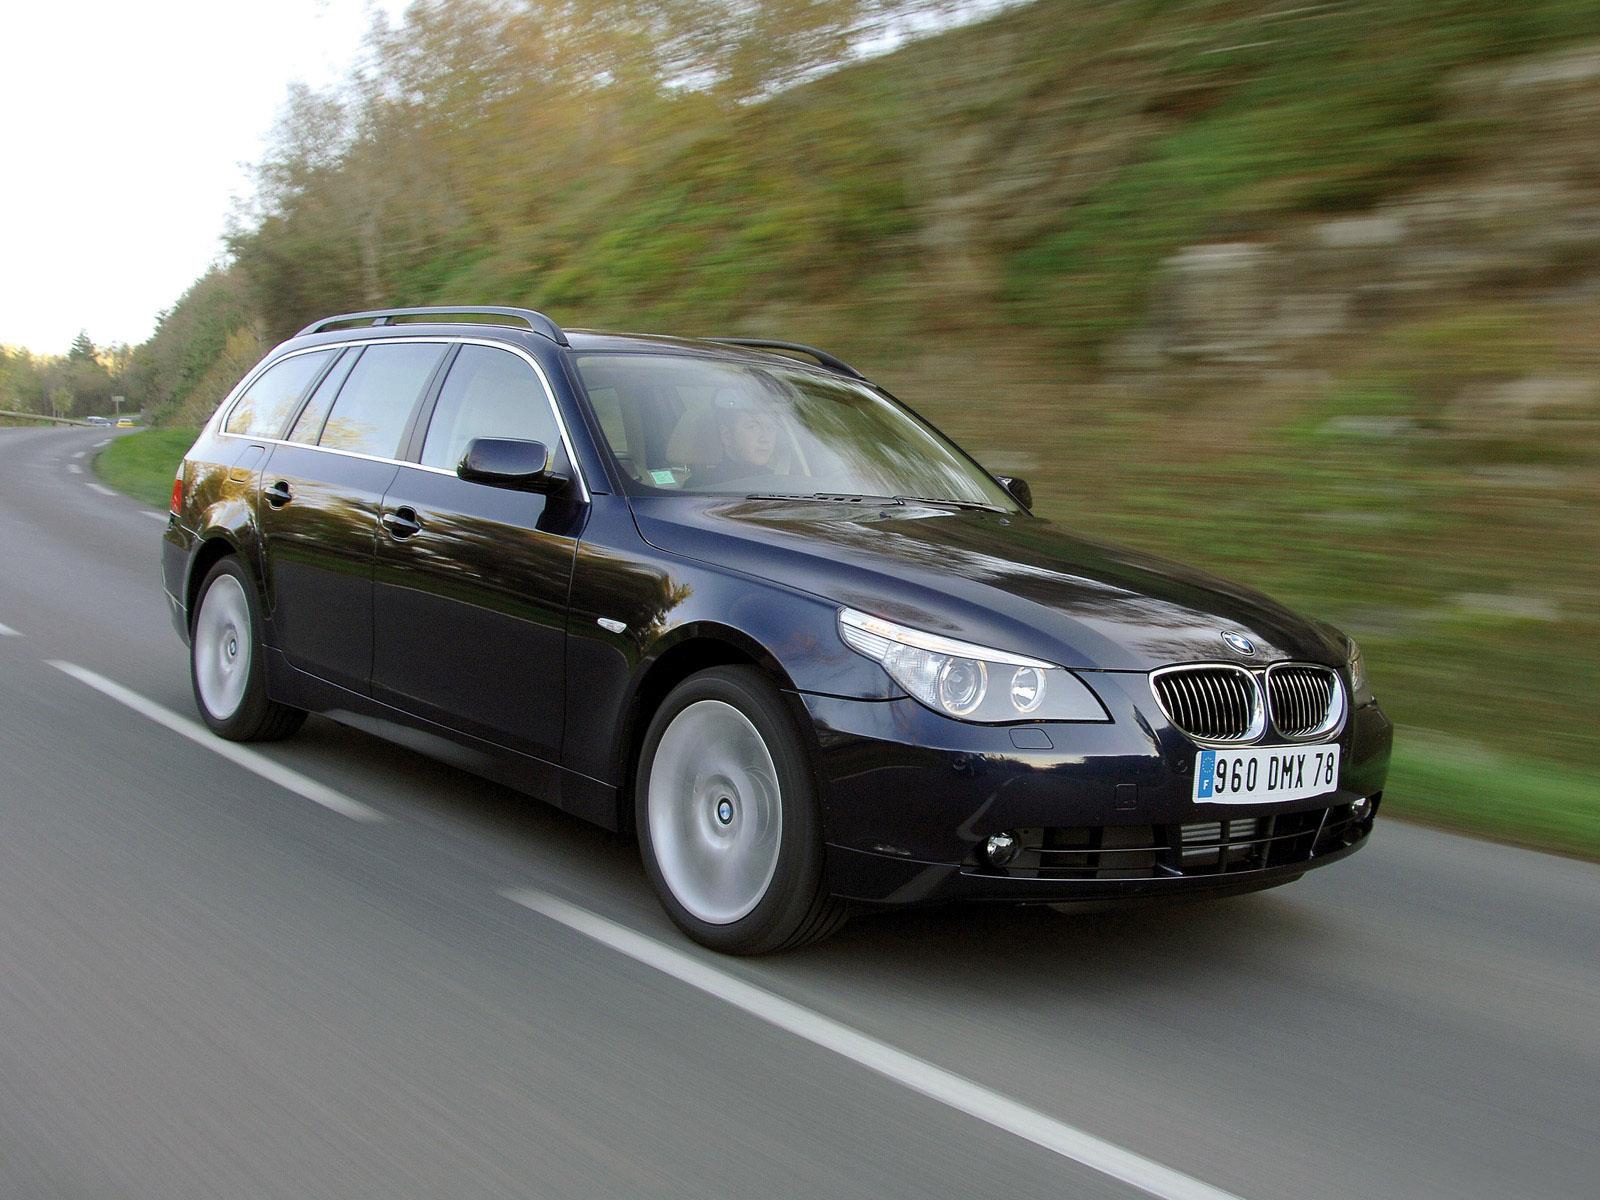 bmw 530 xd photos reviews news specs buy car. Black Bedroom Furniture Sets. Home Design Ideas